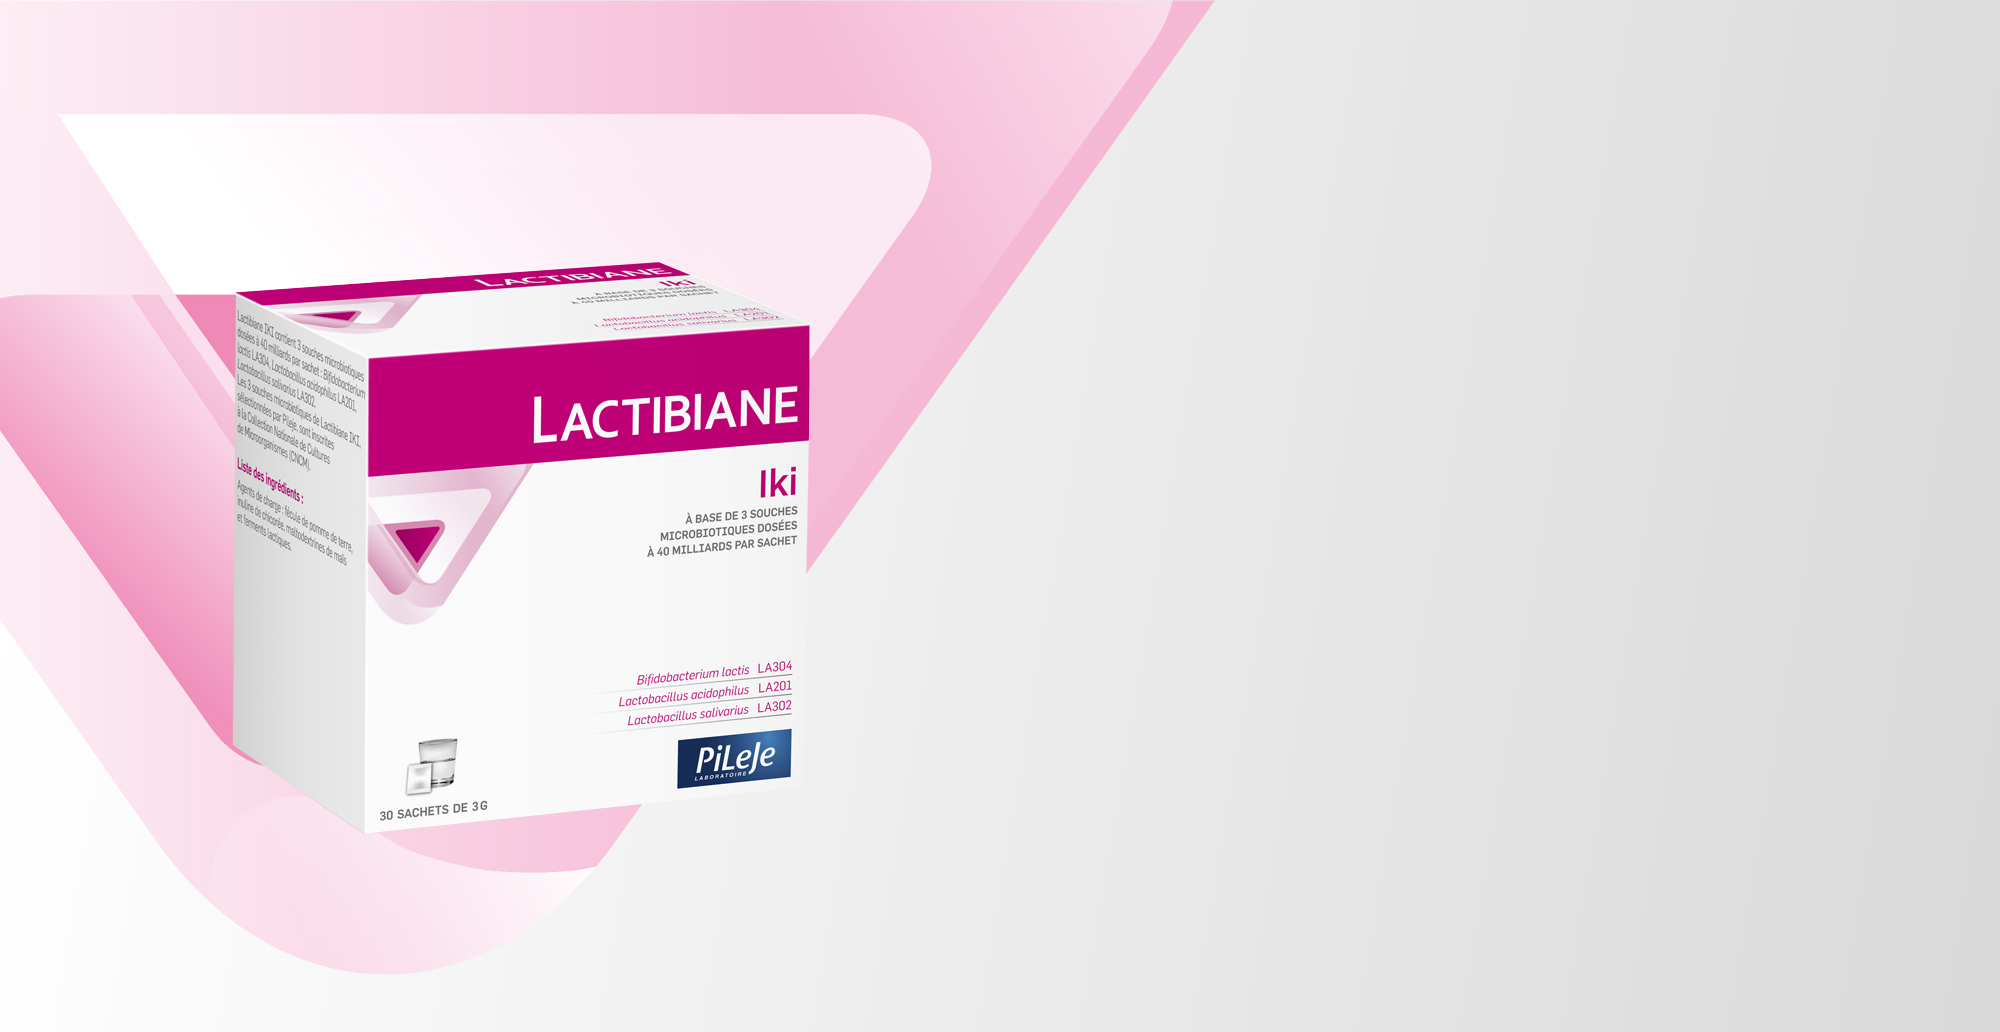 Solutions Lactibiane | Lactibiane Iki